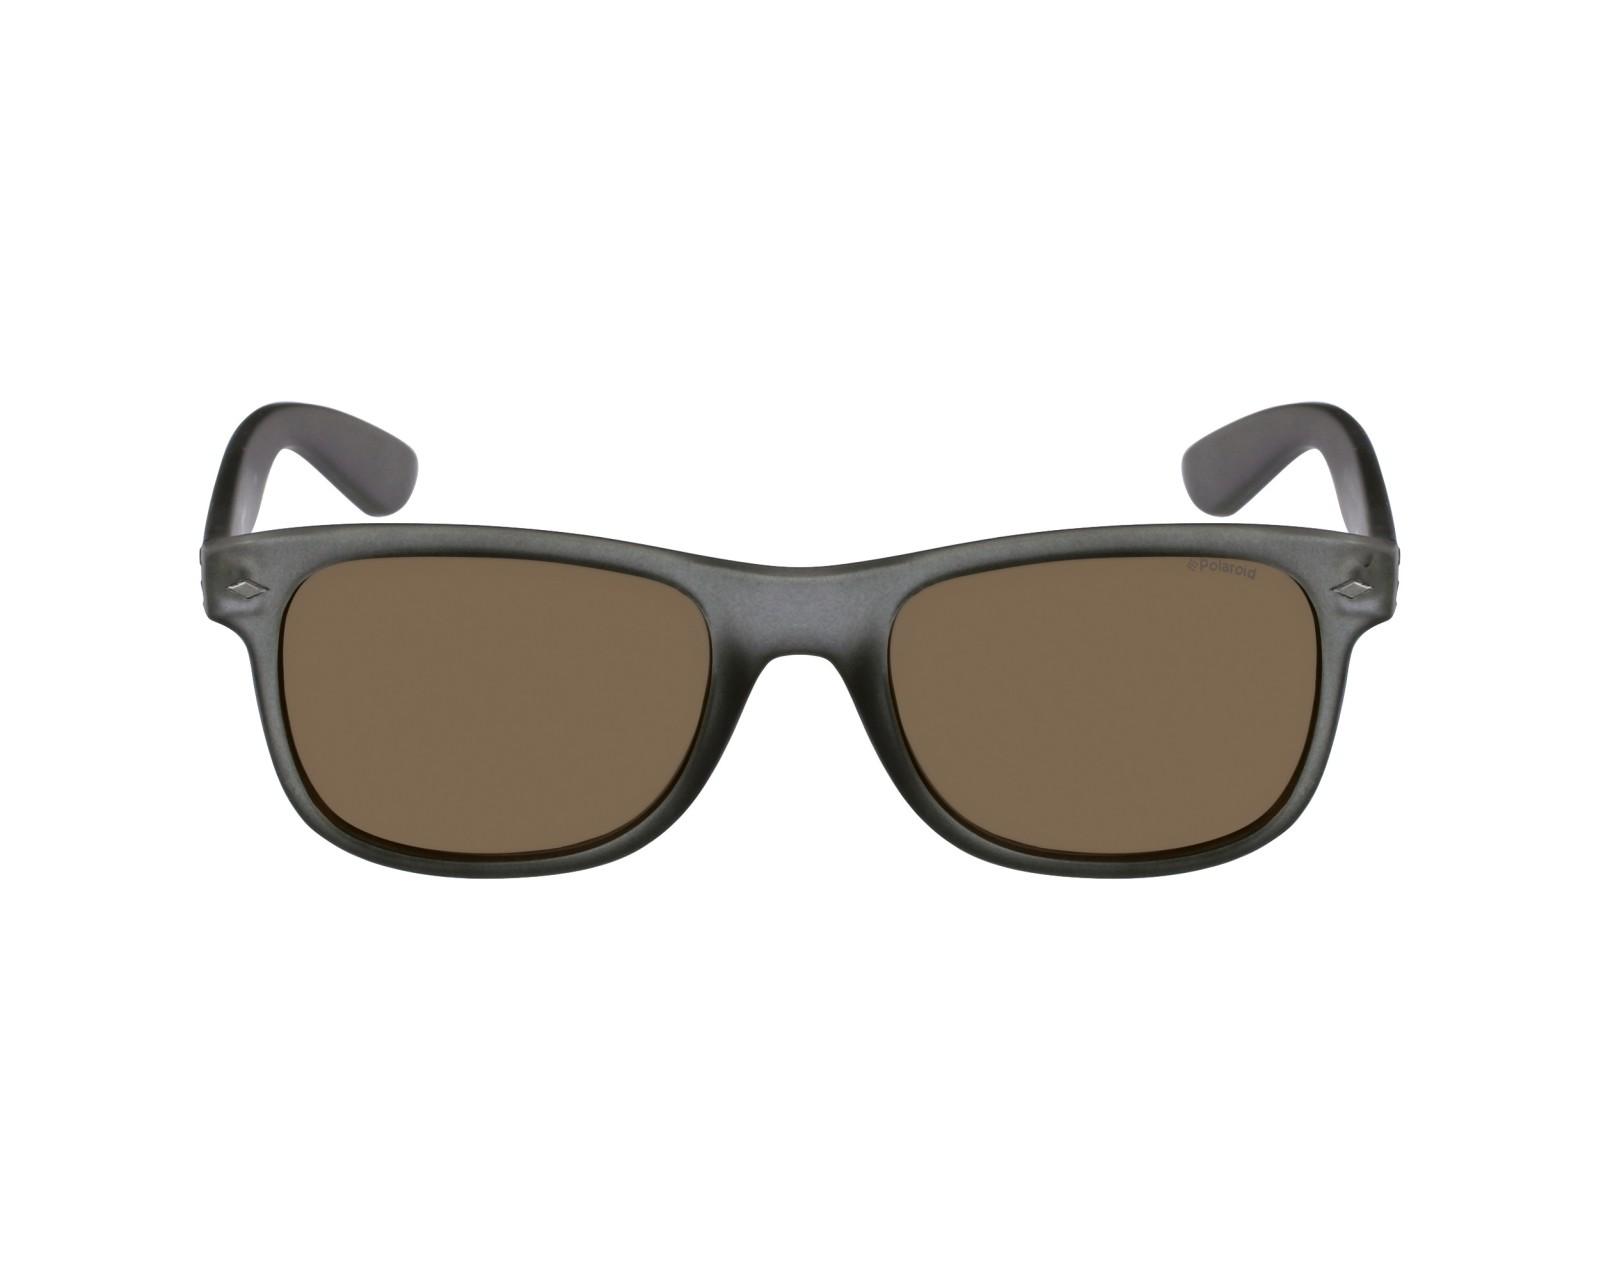 4020d311d7 thumbnail Sunglasses Polaroid PLD-1015-S PVD/IG - Grey profile view